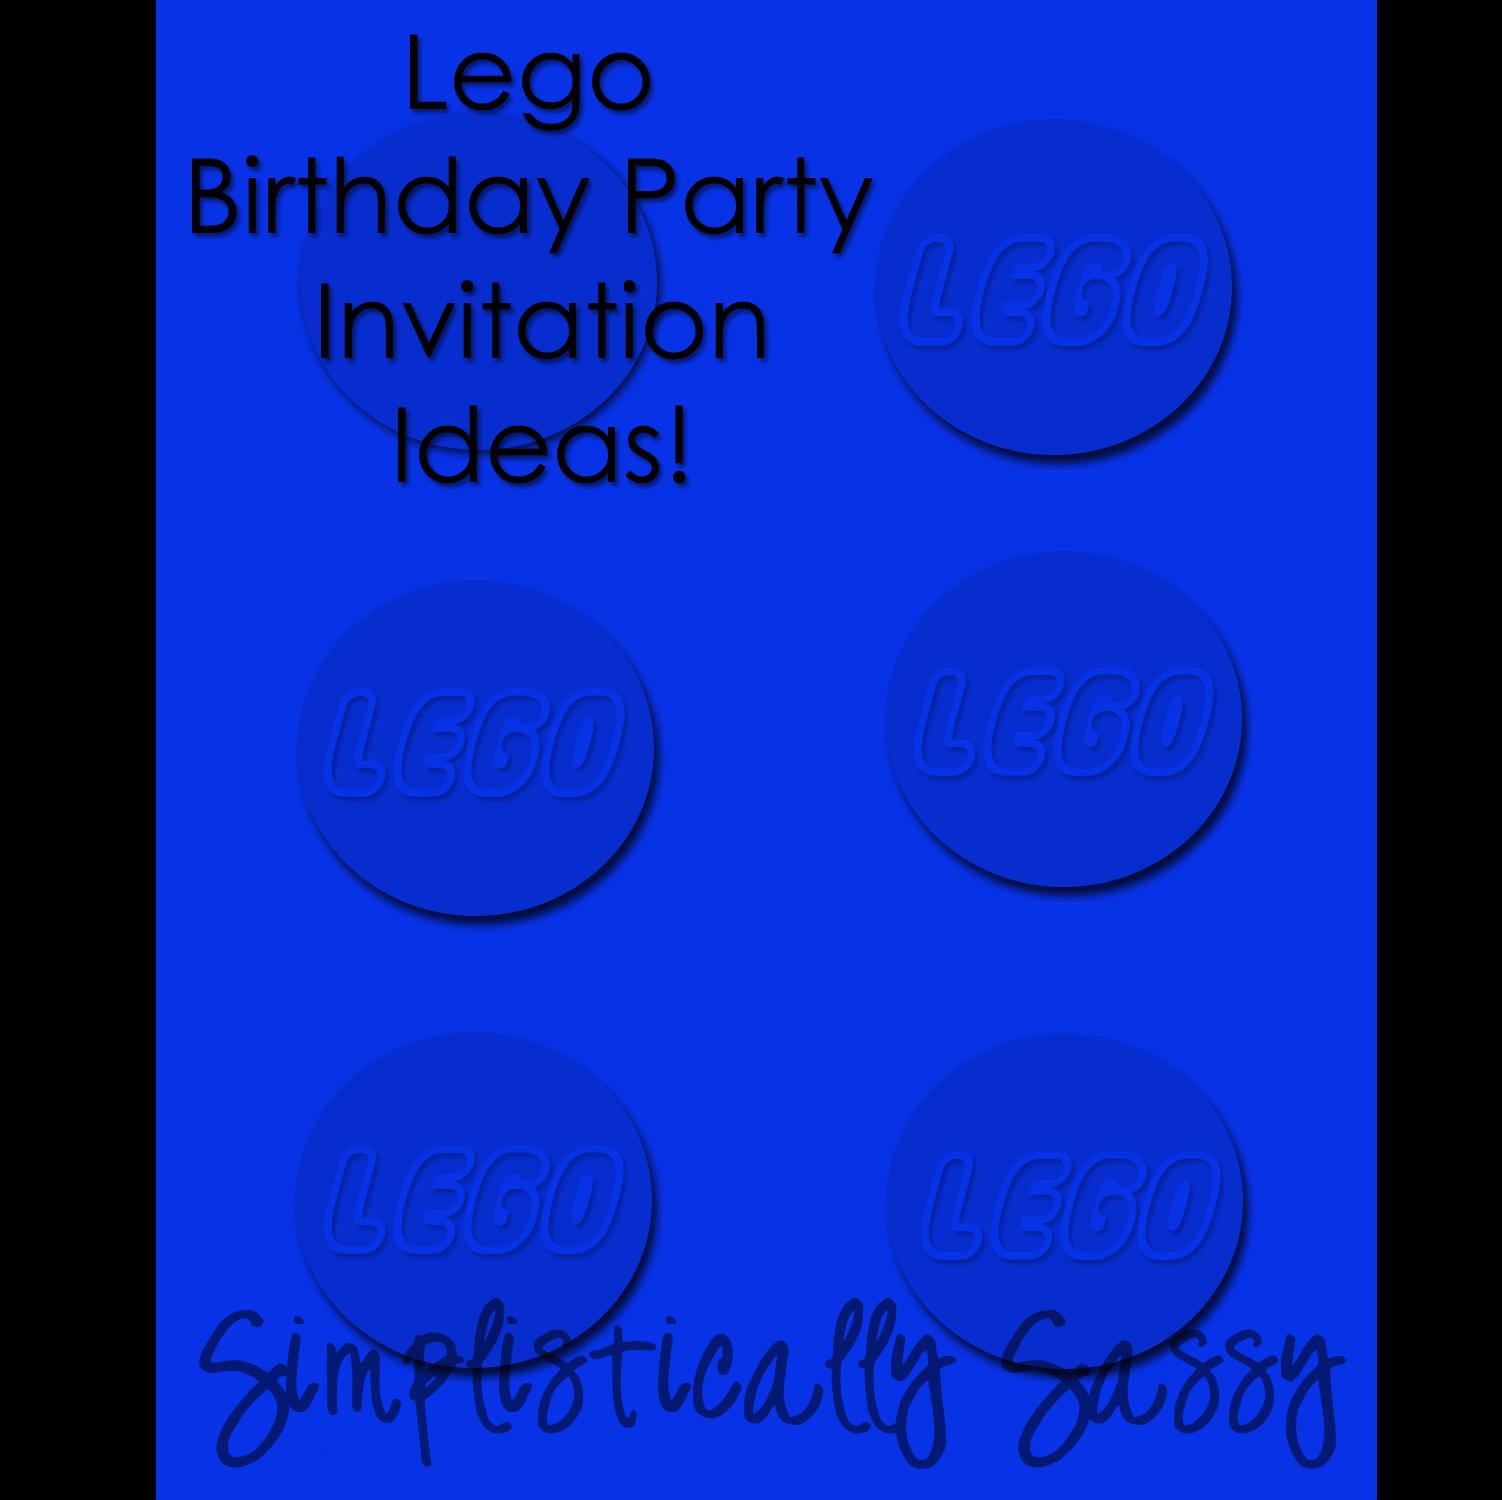 Lego Birthday Party - Simplistically Sassy